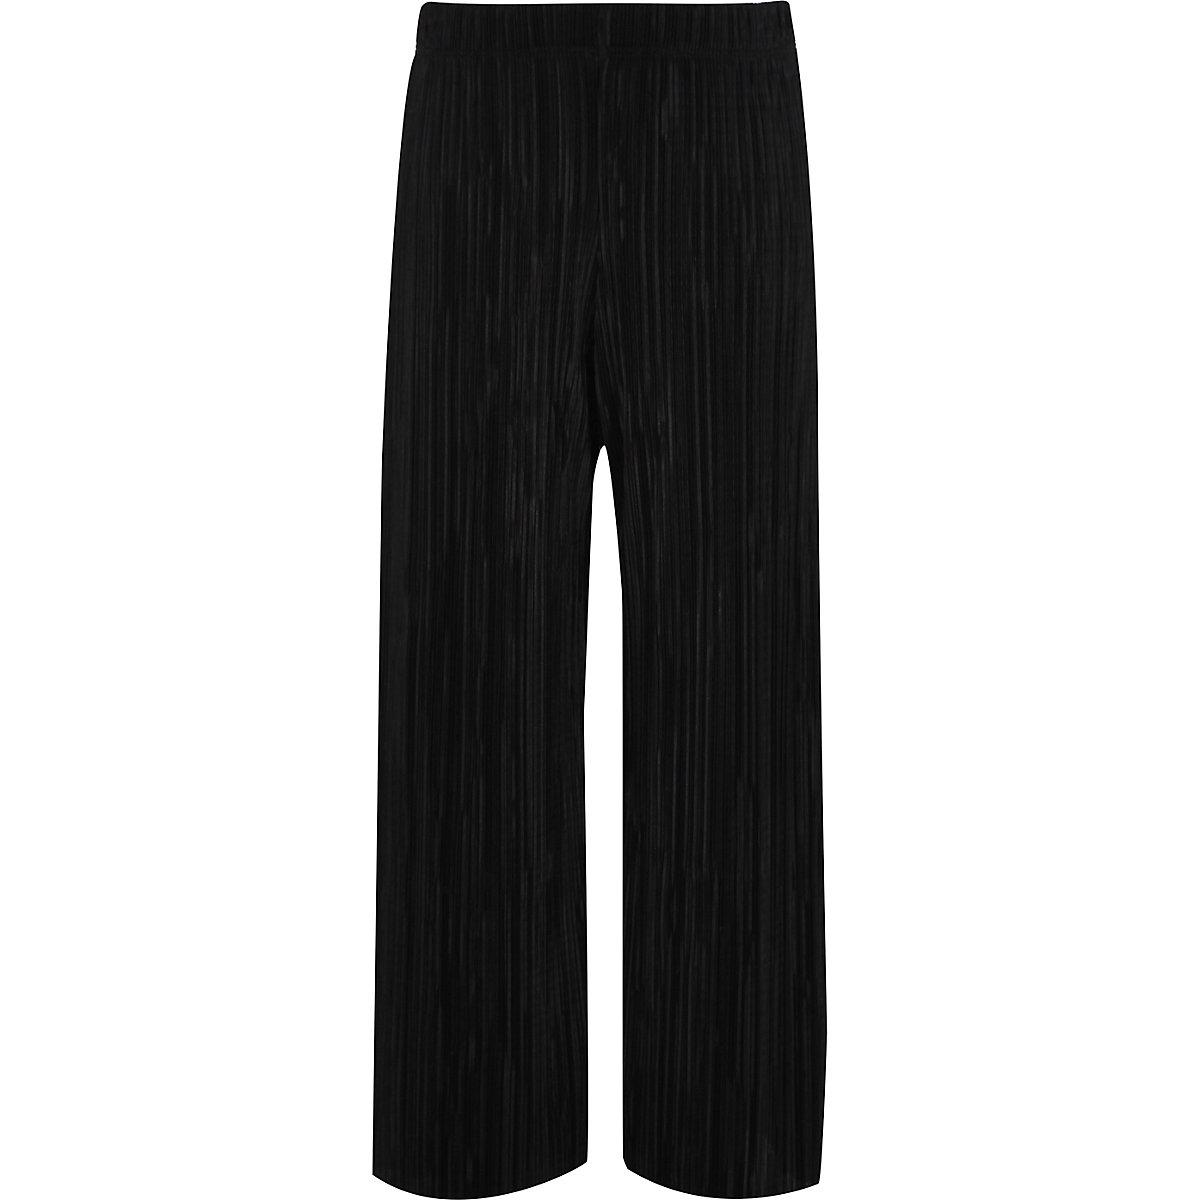 Girls black plisse wide leg pants